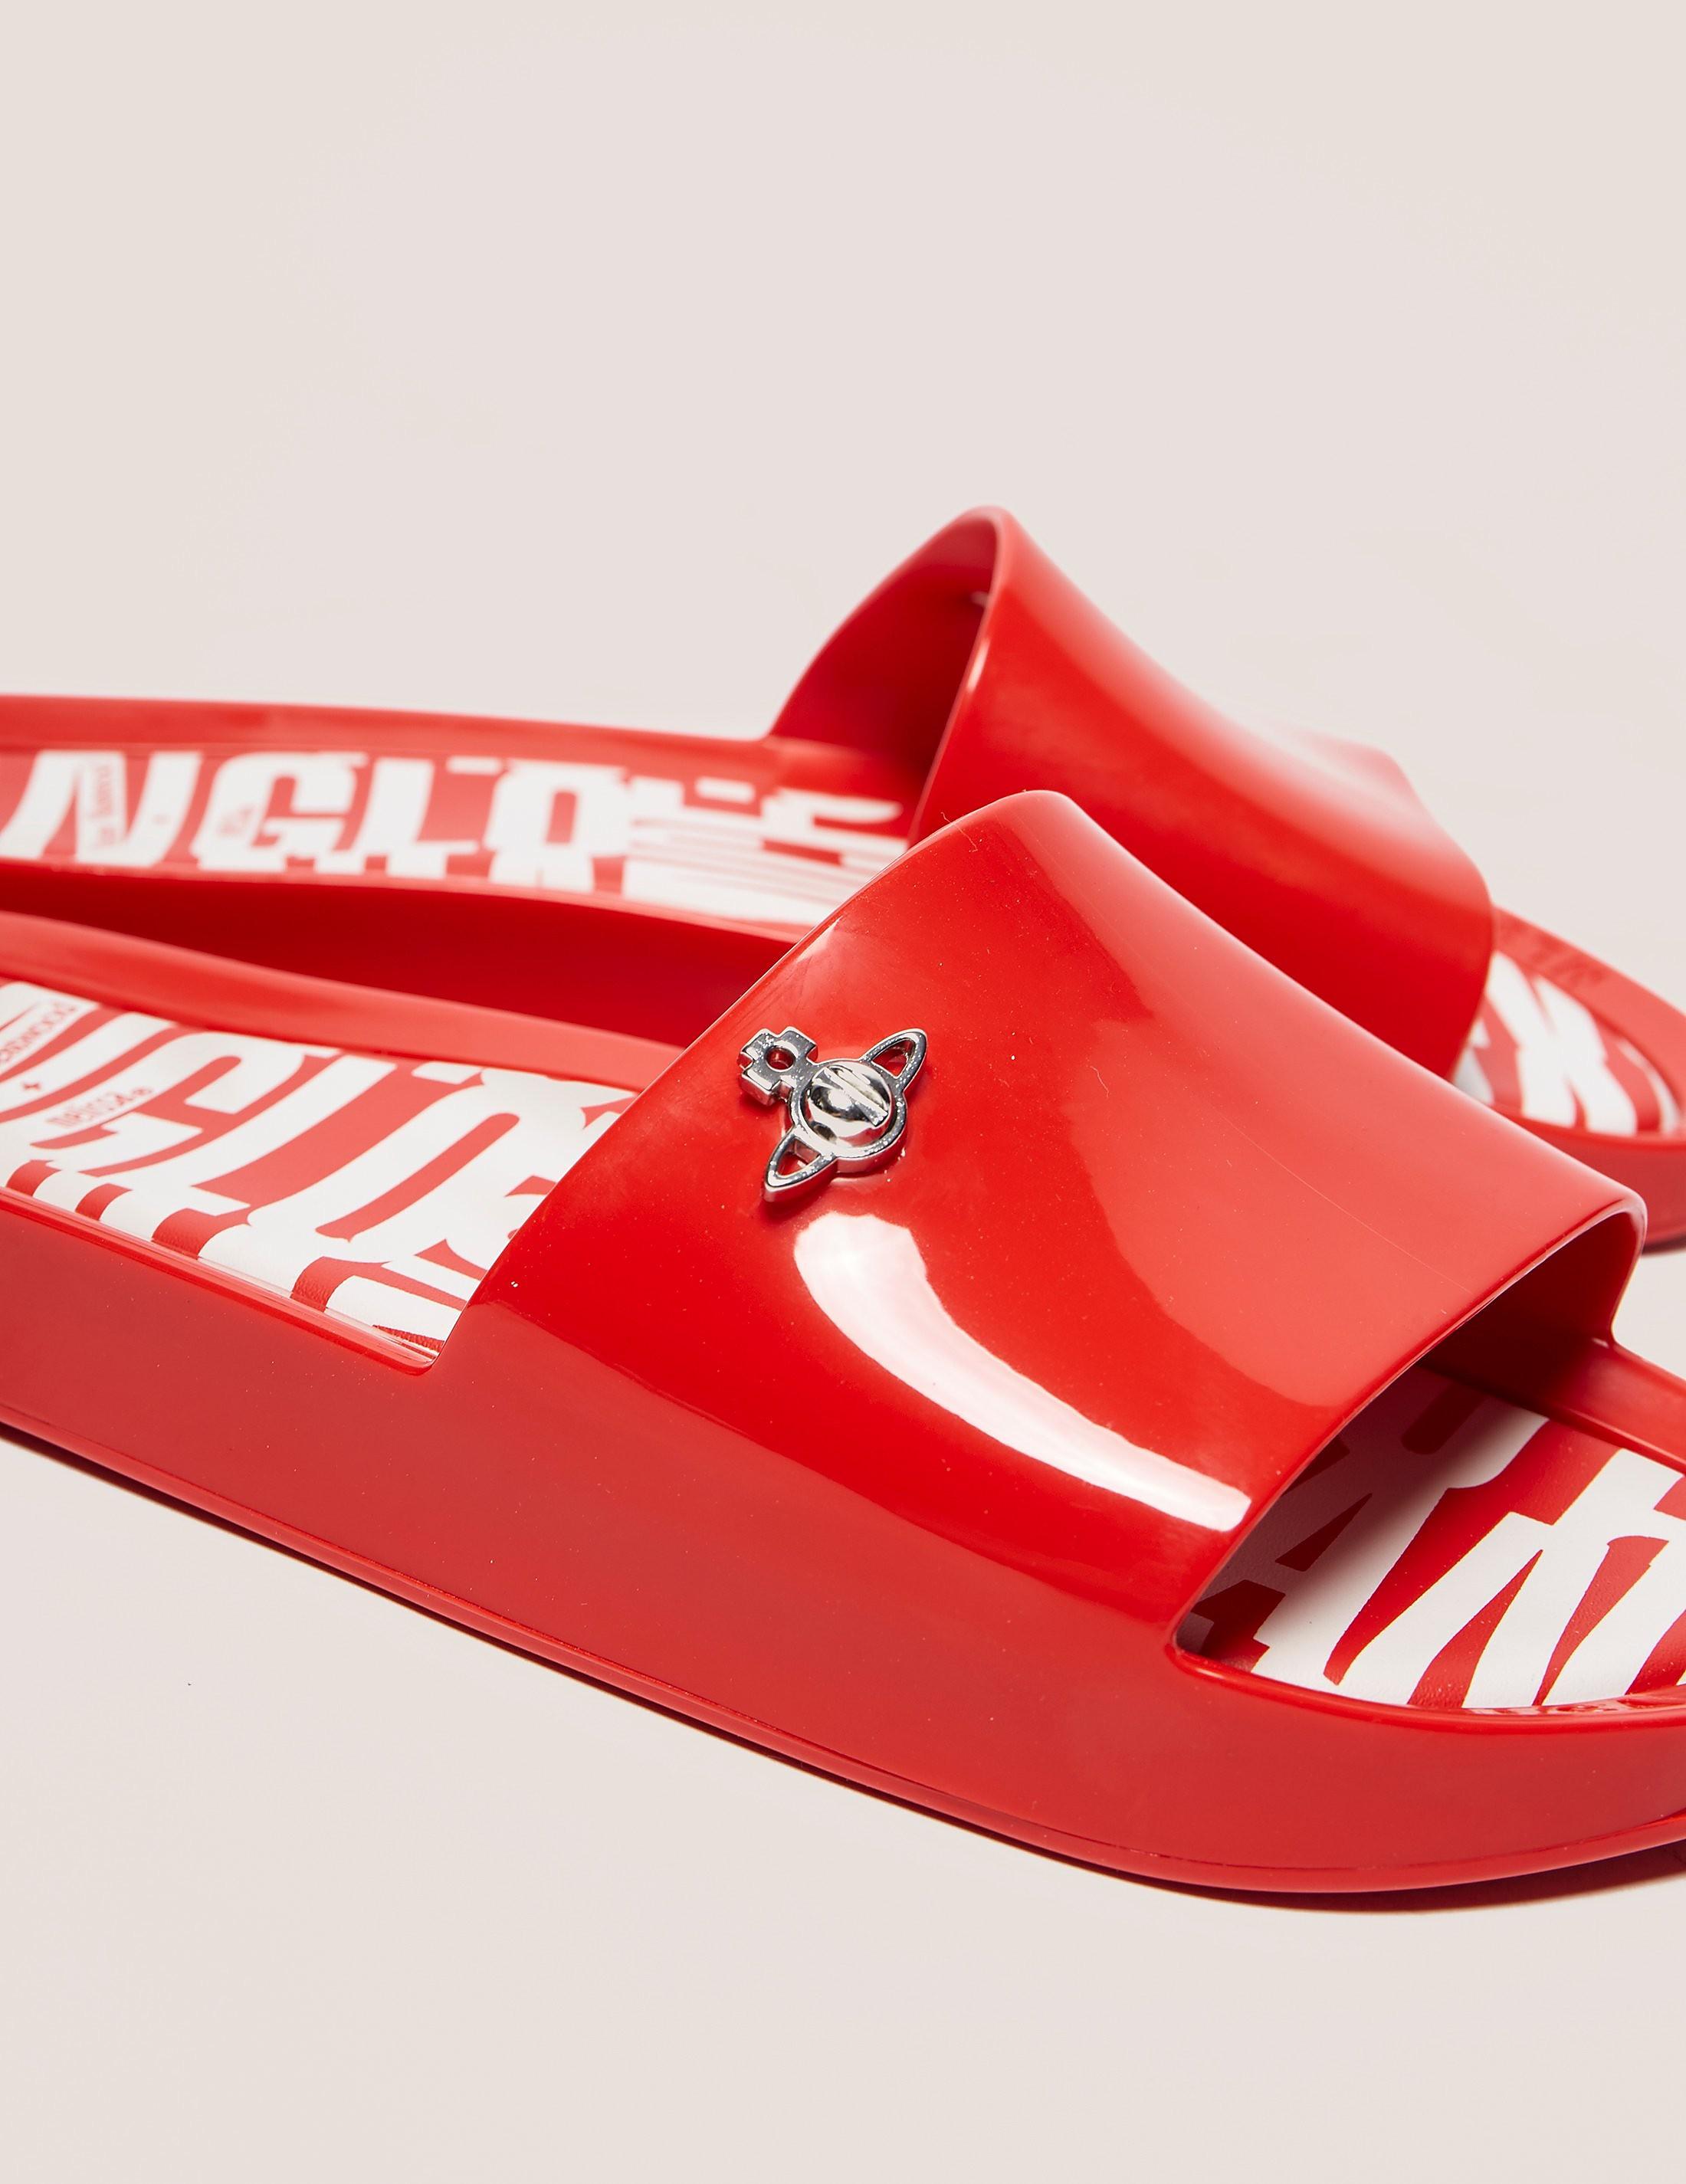 Melissa x Vivienne Westwood Slide Sandals